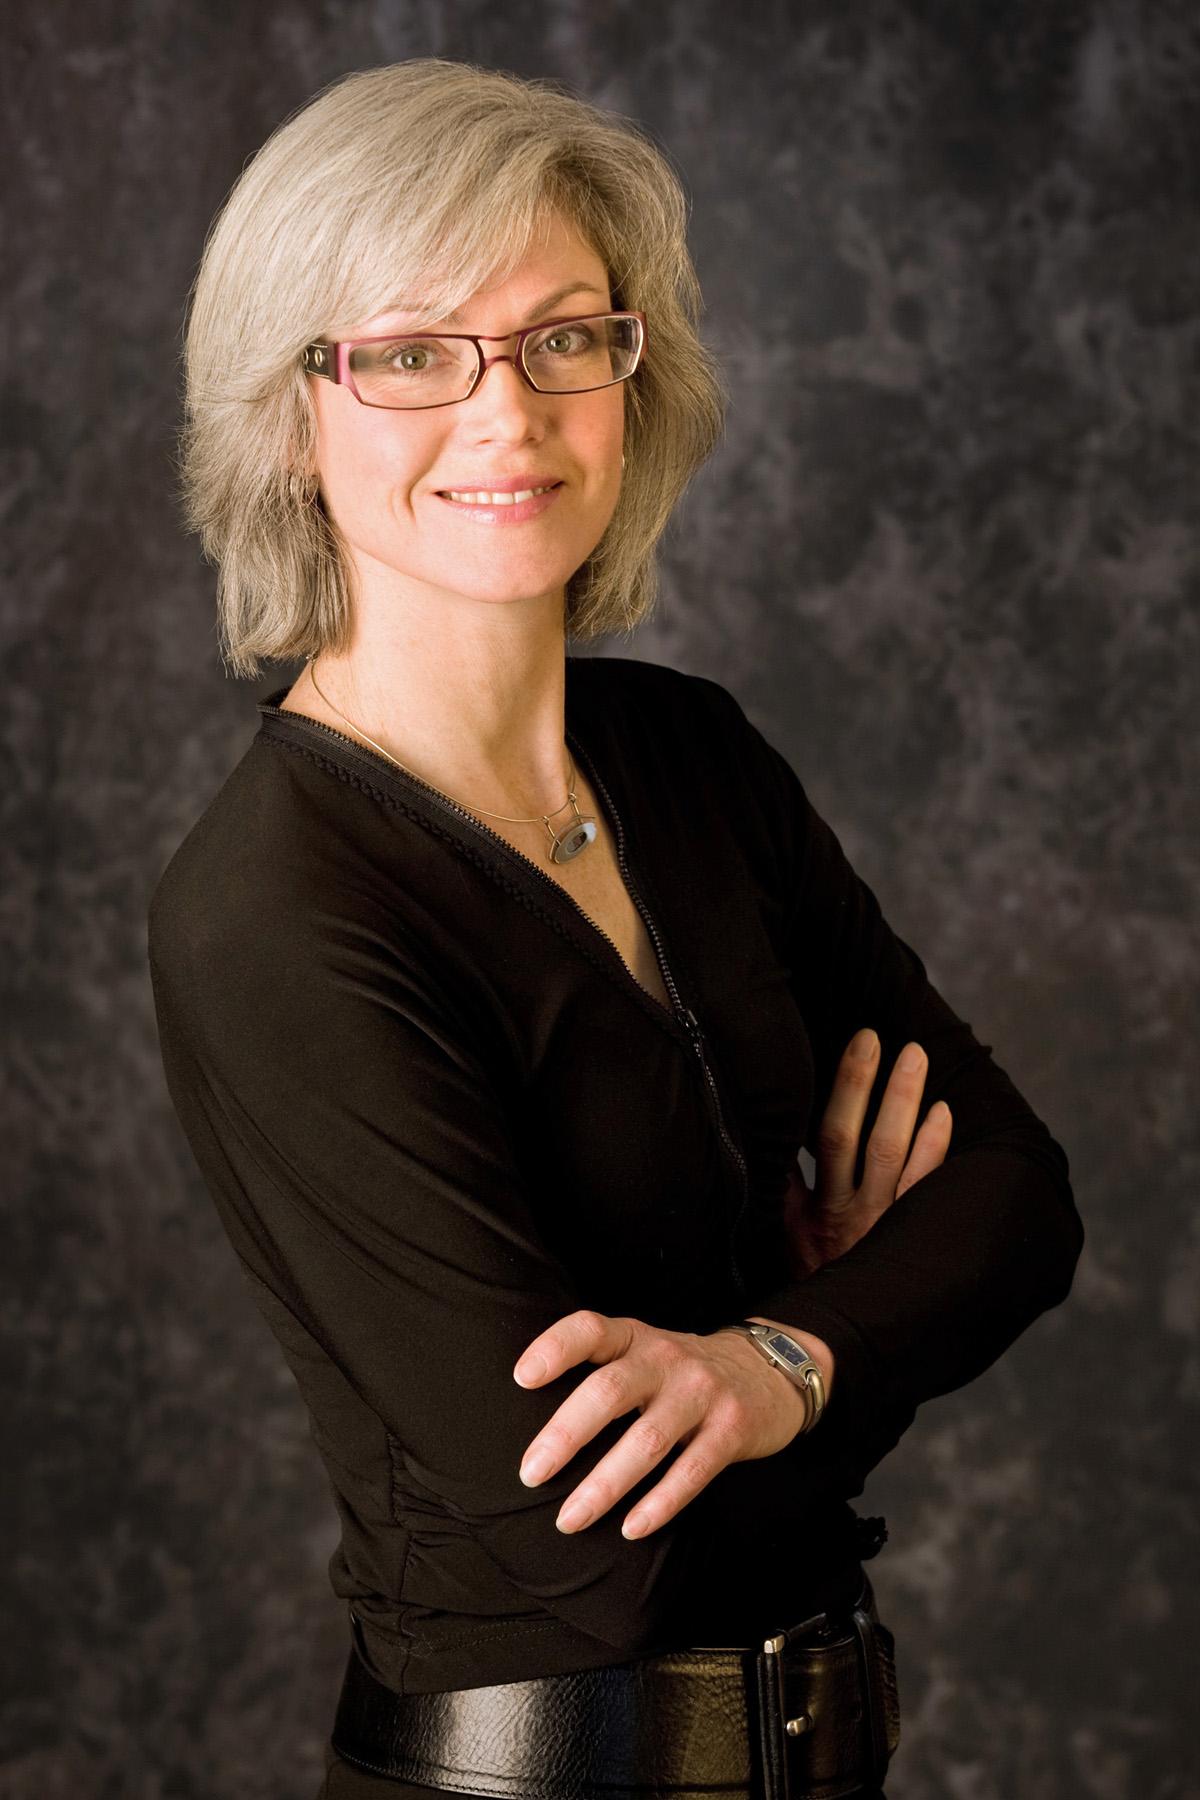 Pamela Scott-Crace - Secretary/Community Volunteer